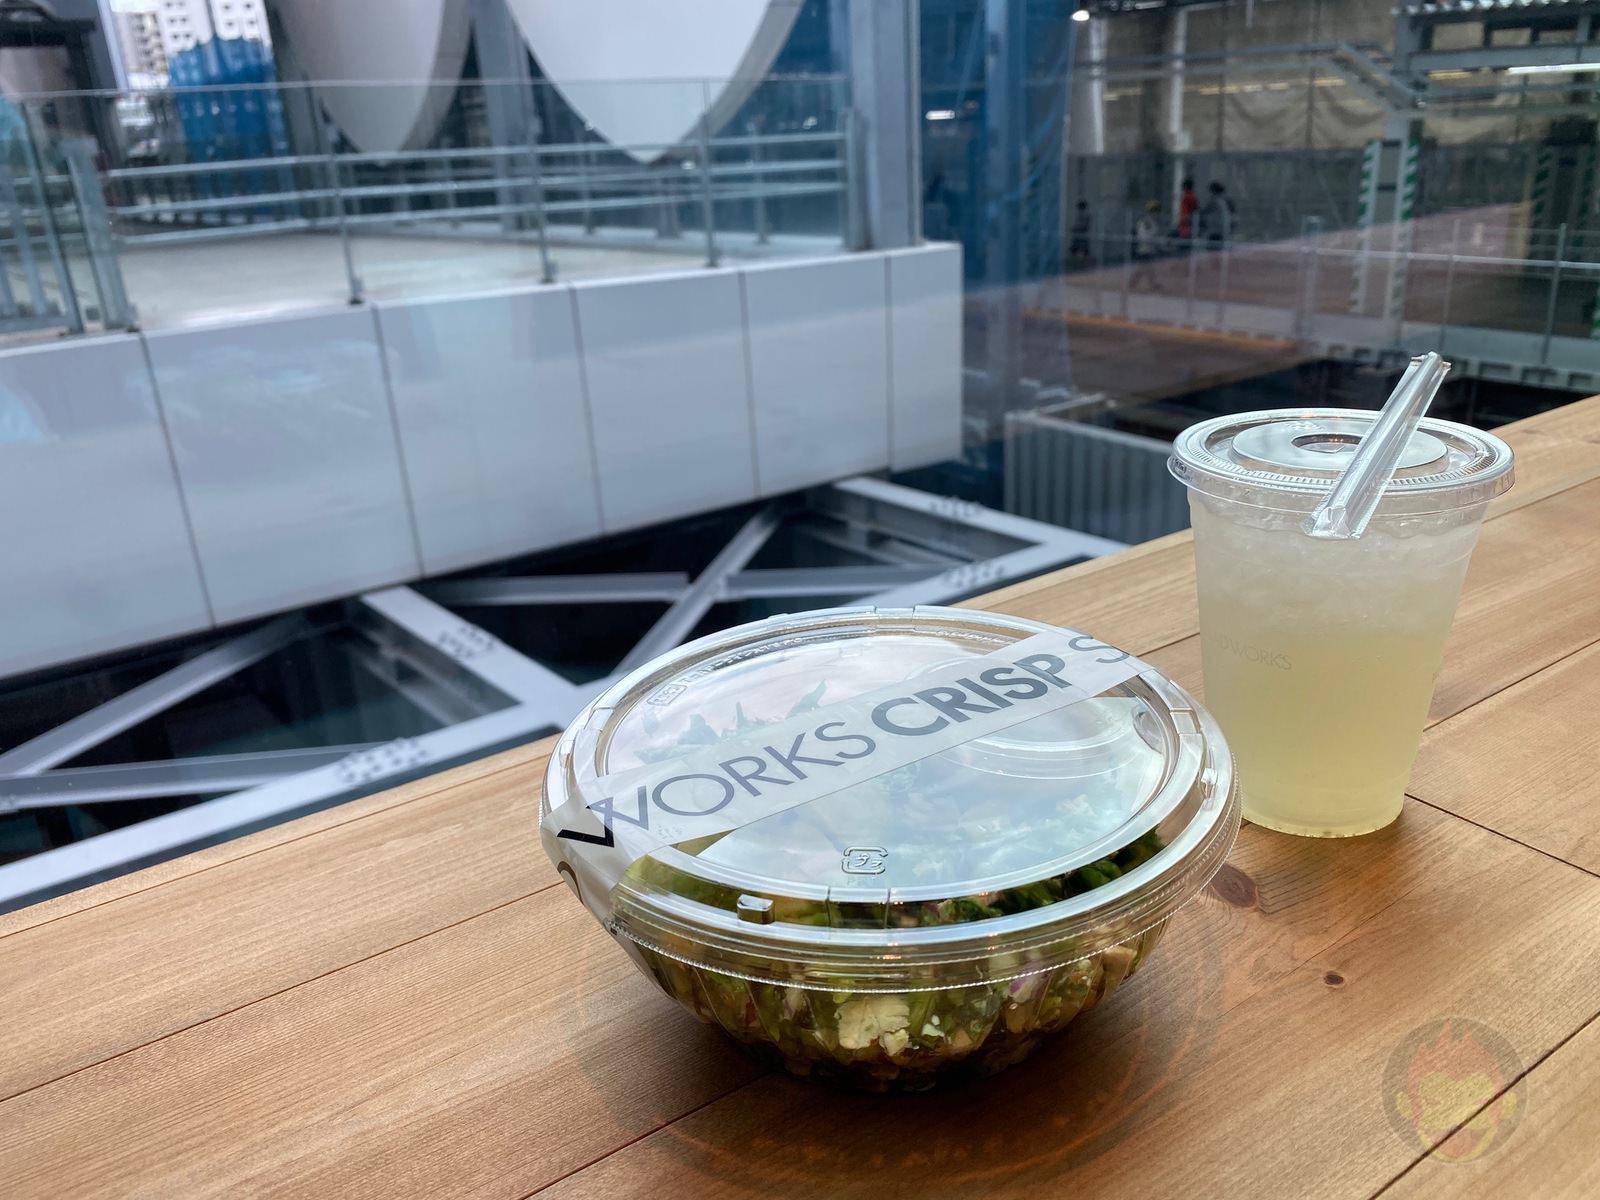 Crisp-Salad-Works-Shibuya-Scramble-09.jpeg